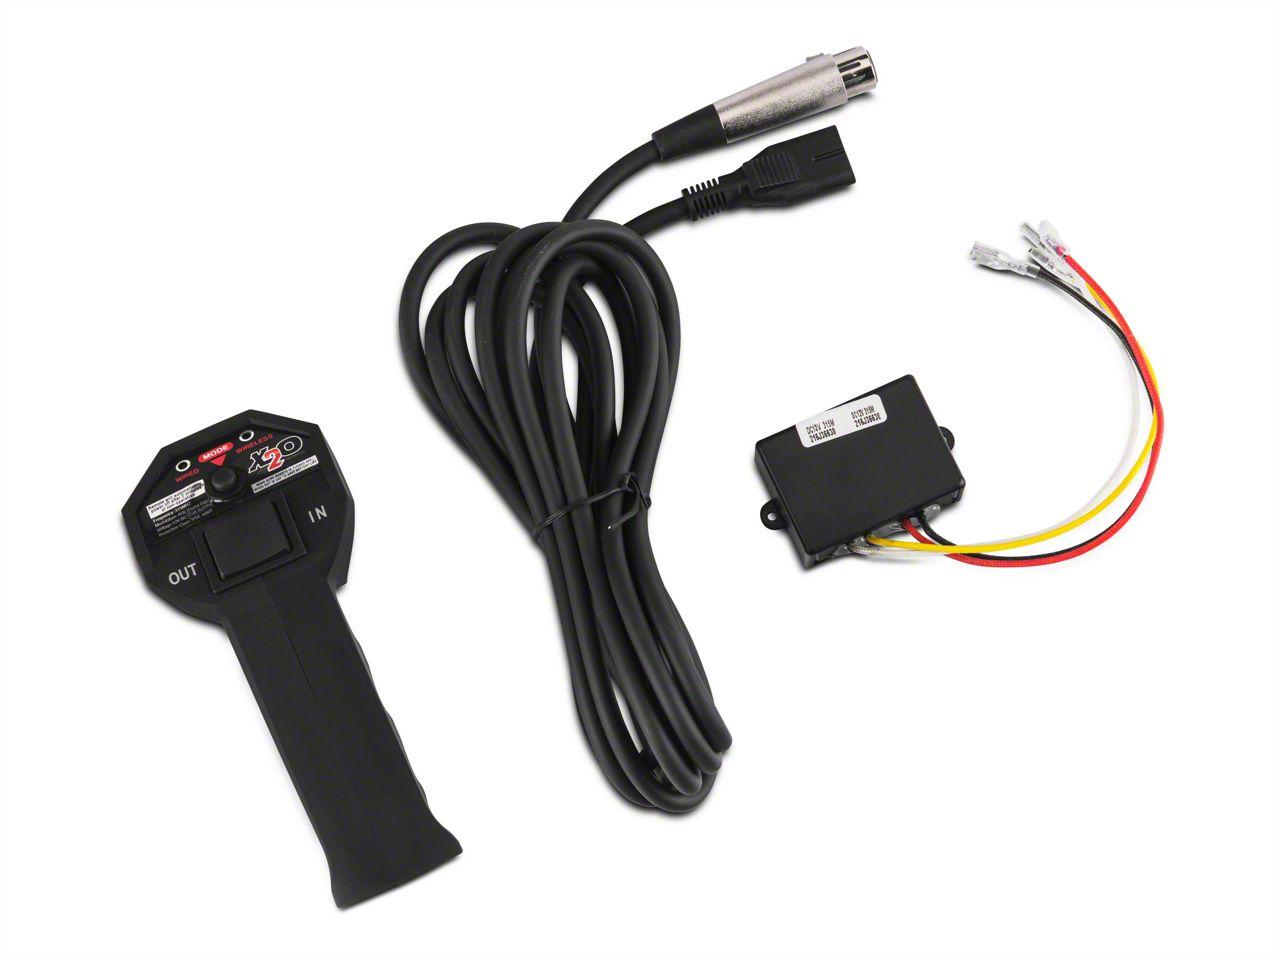 Smittybilt Winch Remote Control w/ Transmitter